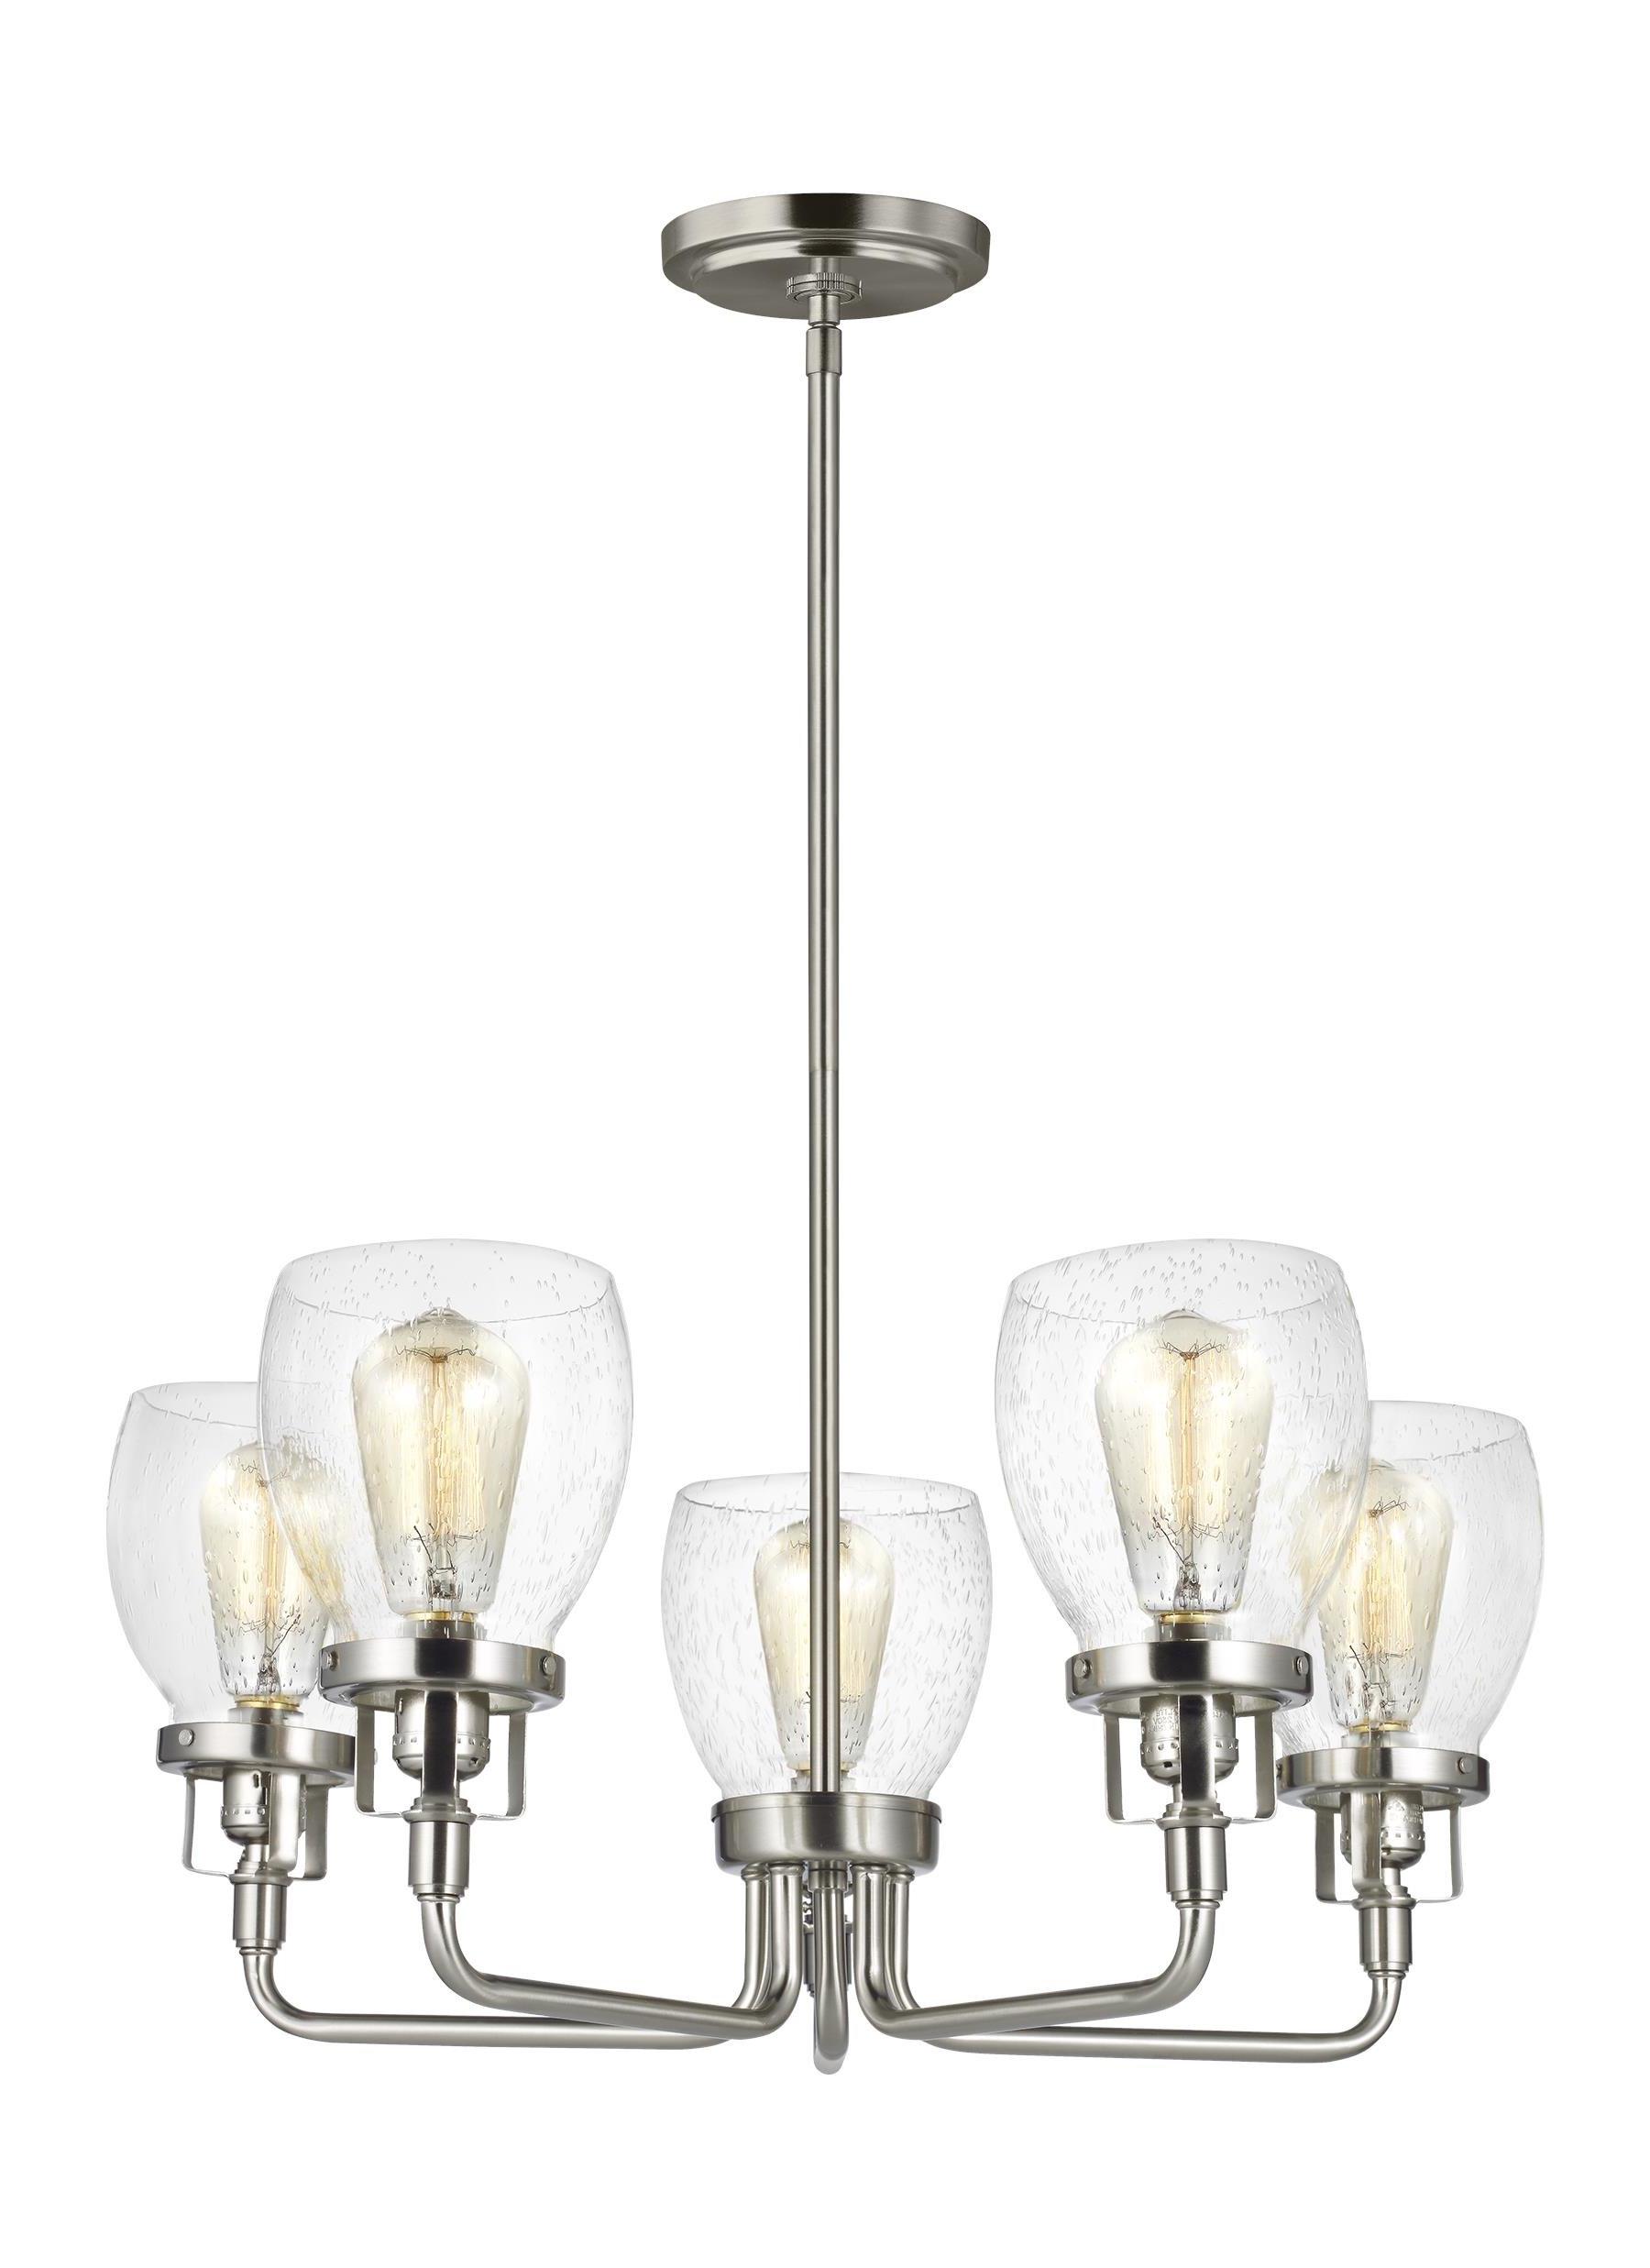 Akash Industrial Vintage 1 Light Geometric Pendants With Regard To 2019 Vintage Industrial Lighting (View 11 of 25)